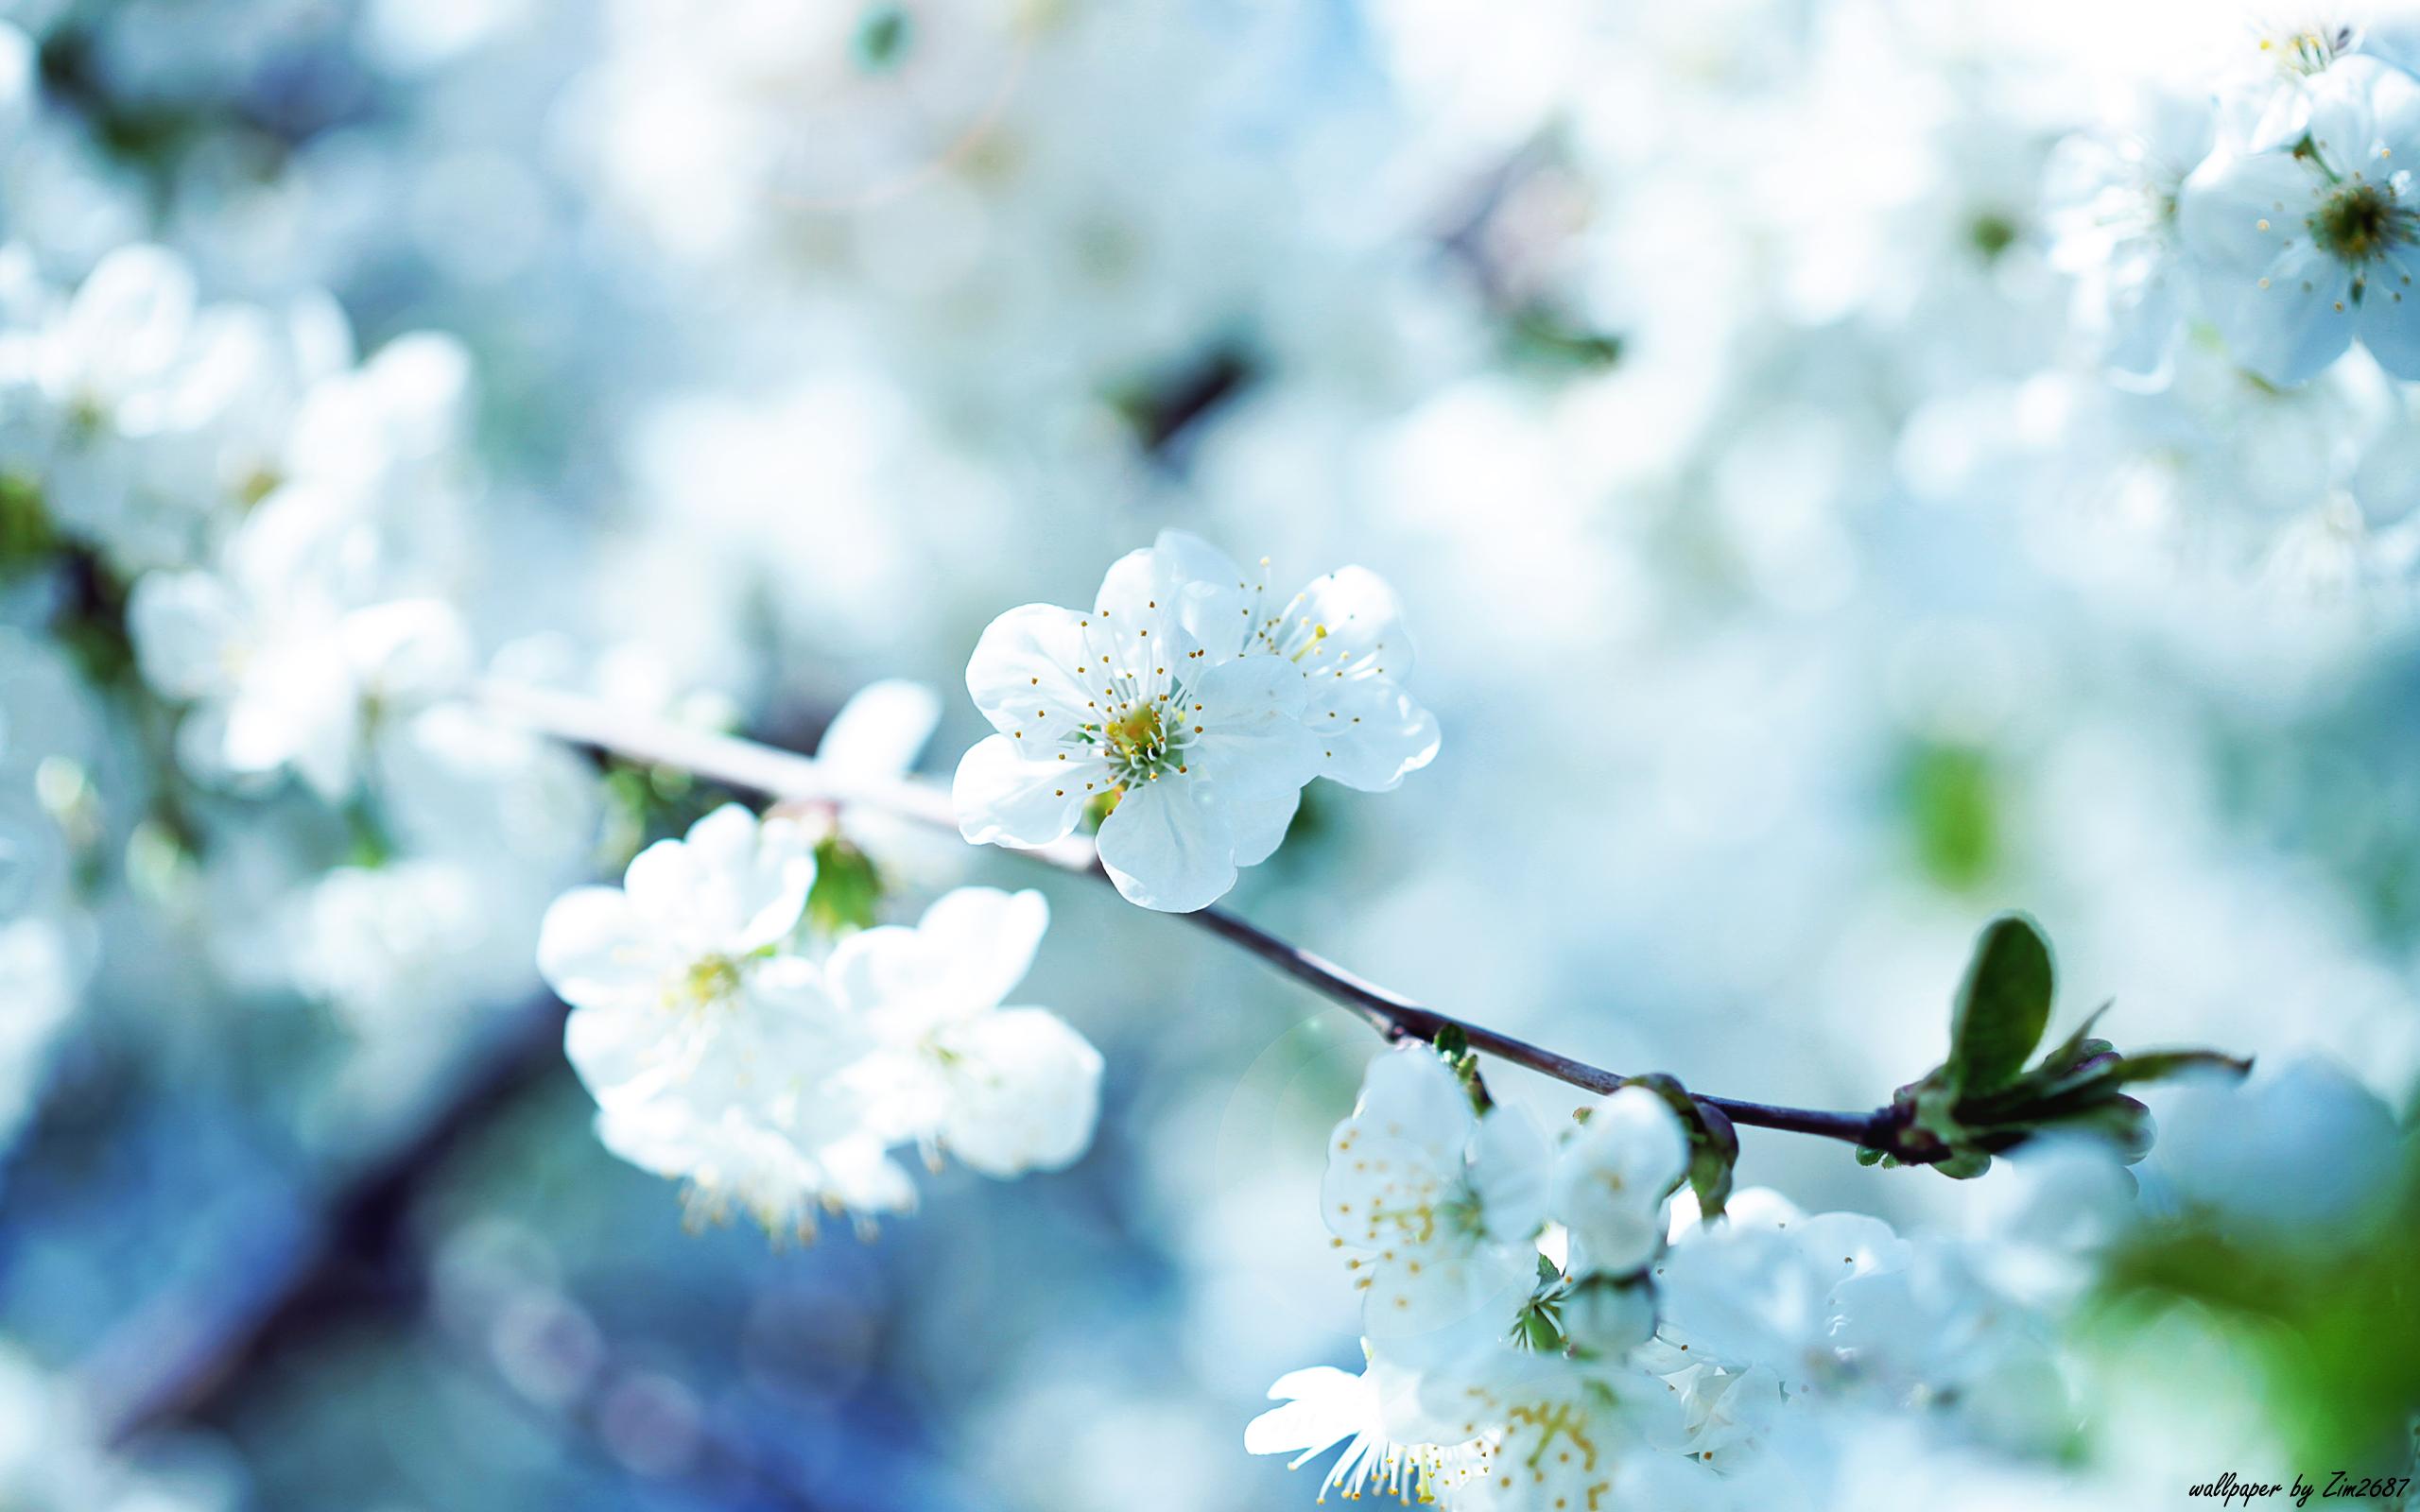 Cherry blossom wallpapers Cherry blossom stock photos 2560x1600